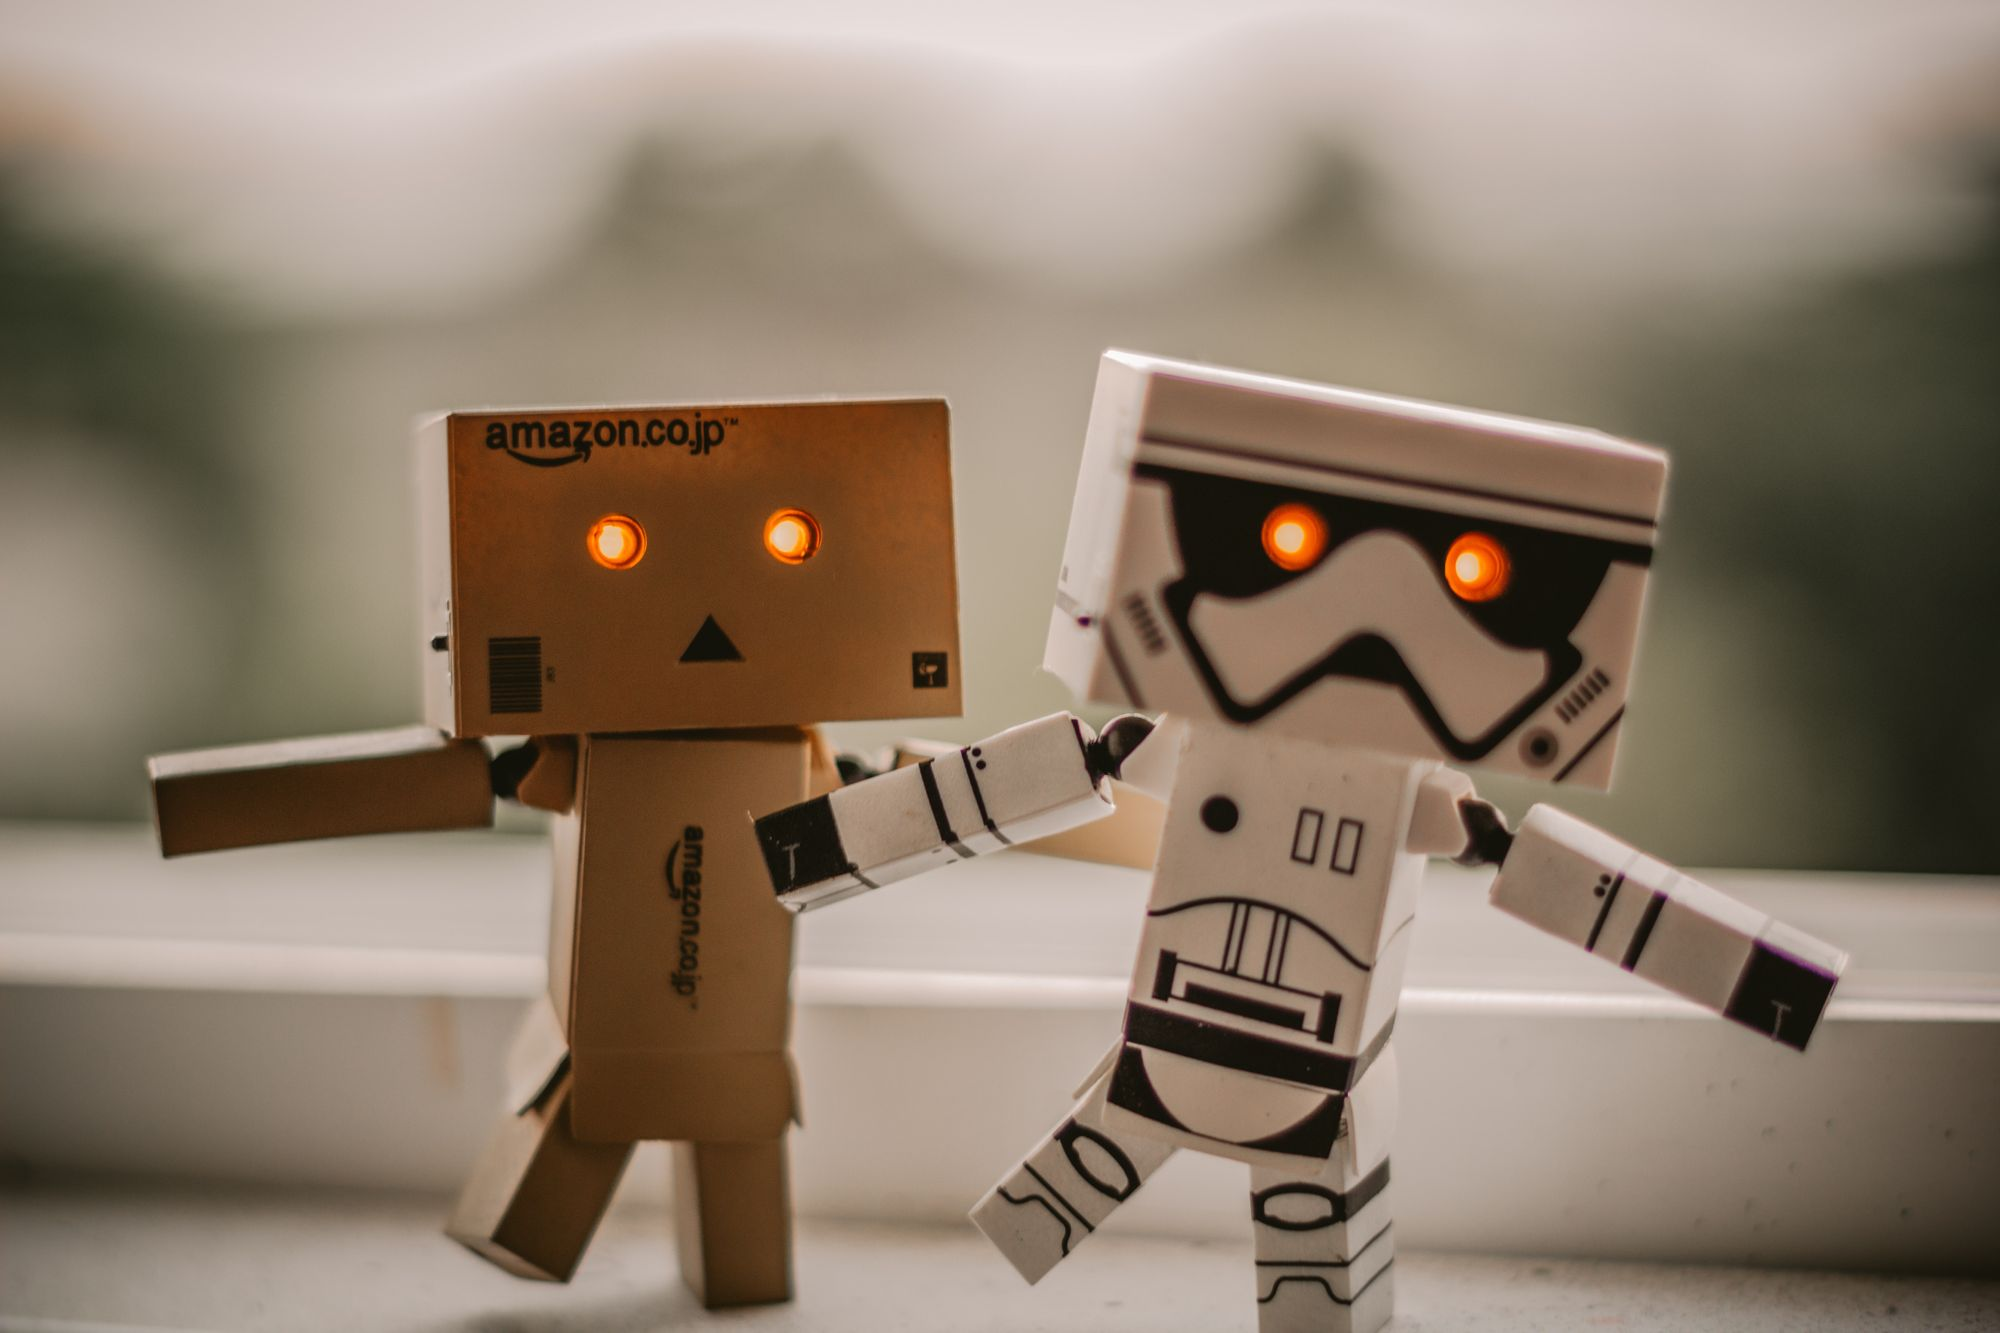 Let the chatbots assist your visitors